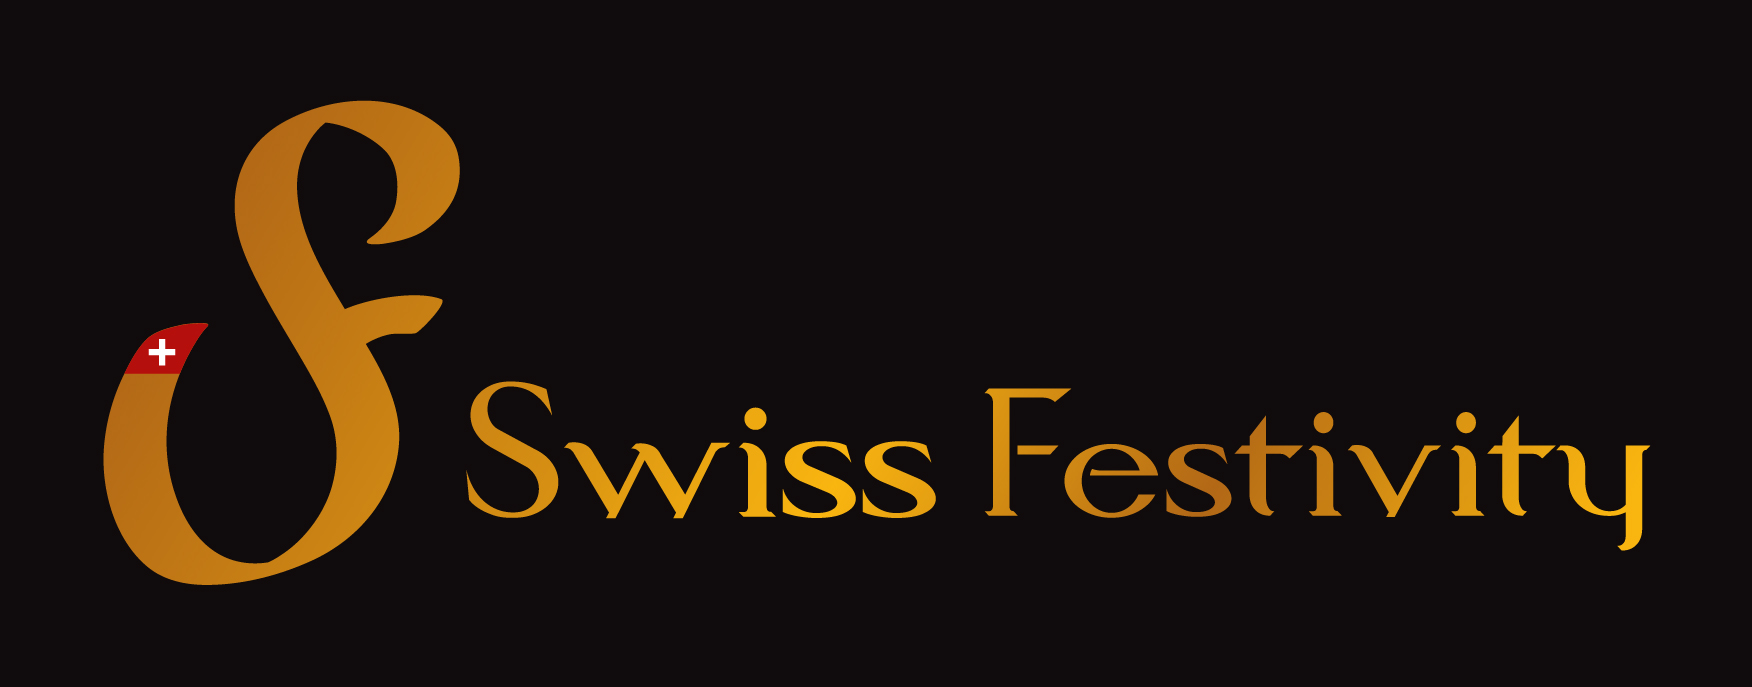 swiss-festivity-rvb